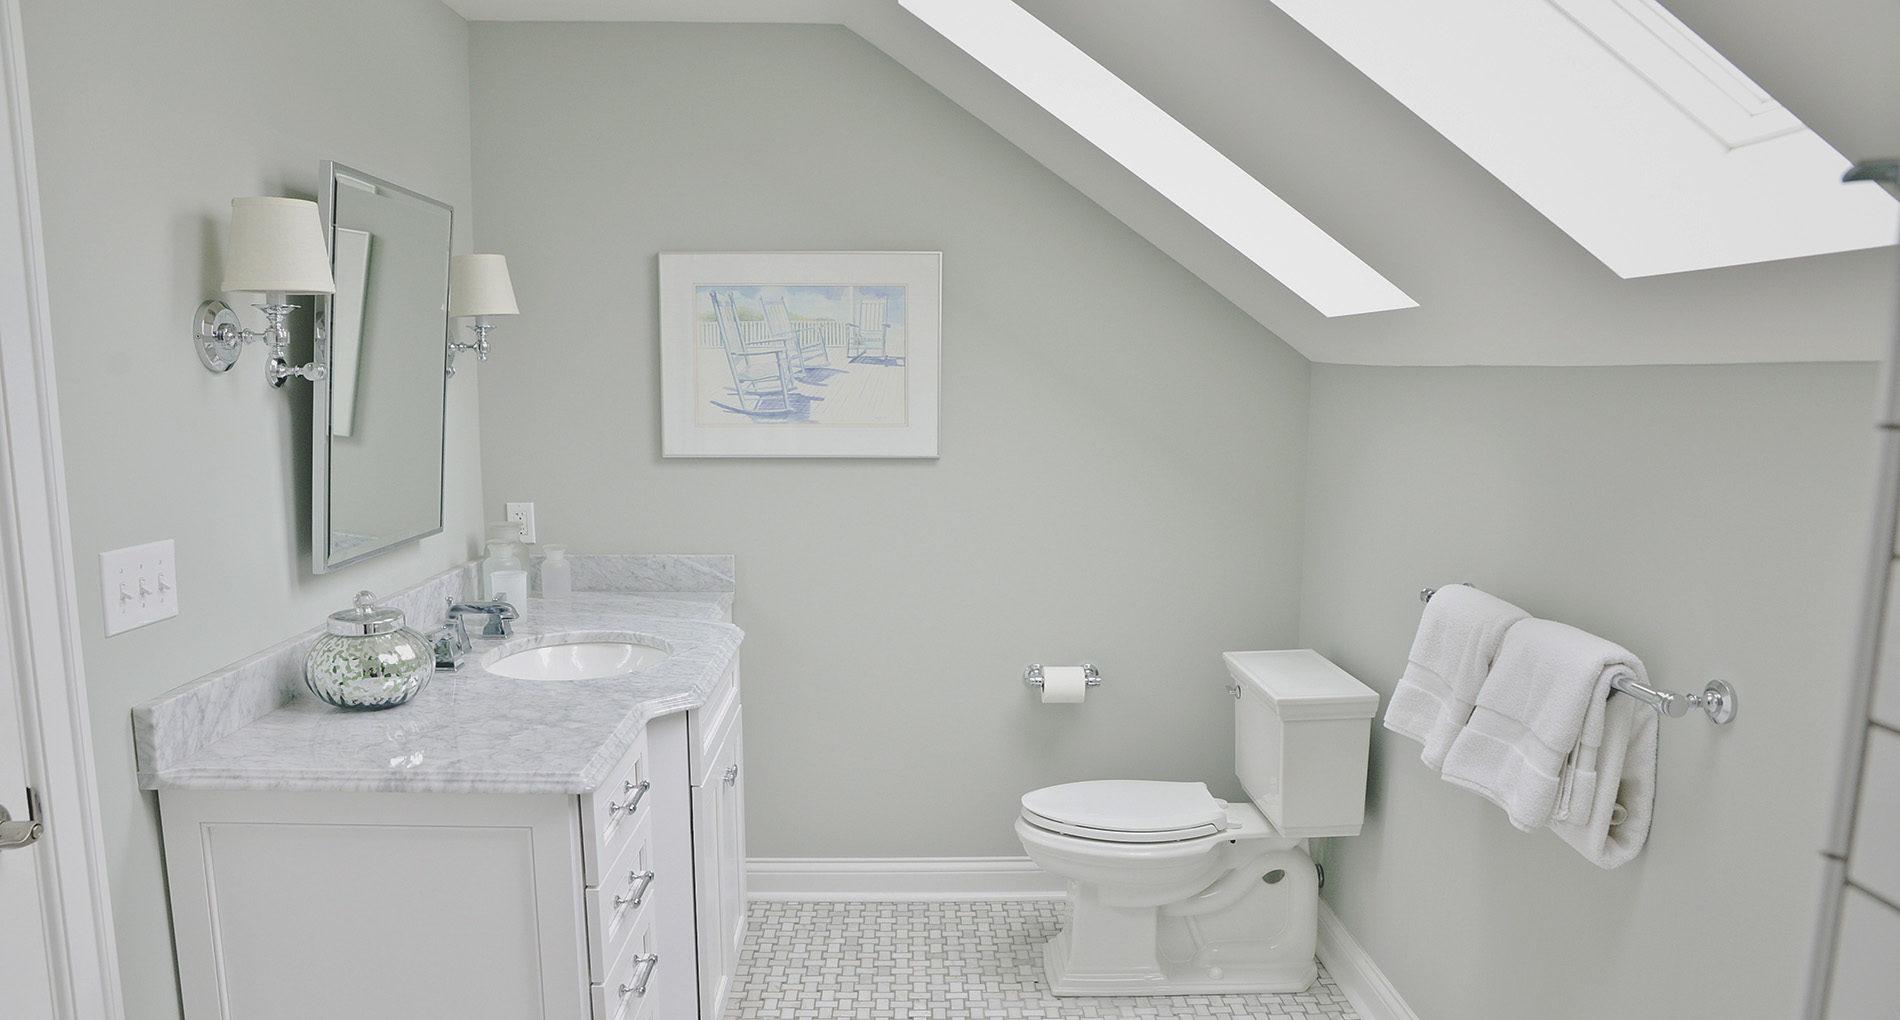 Bathroom Remodel Cuyahogafalls Bathroomrenovation Slider1